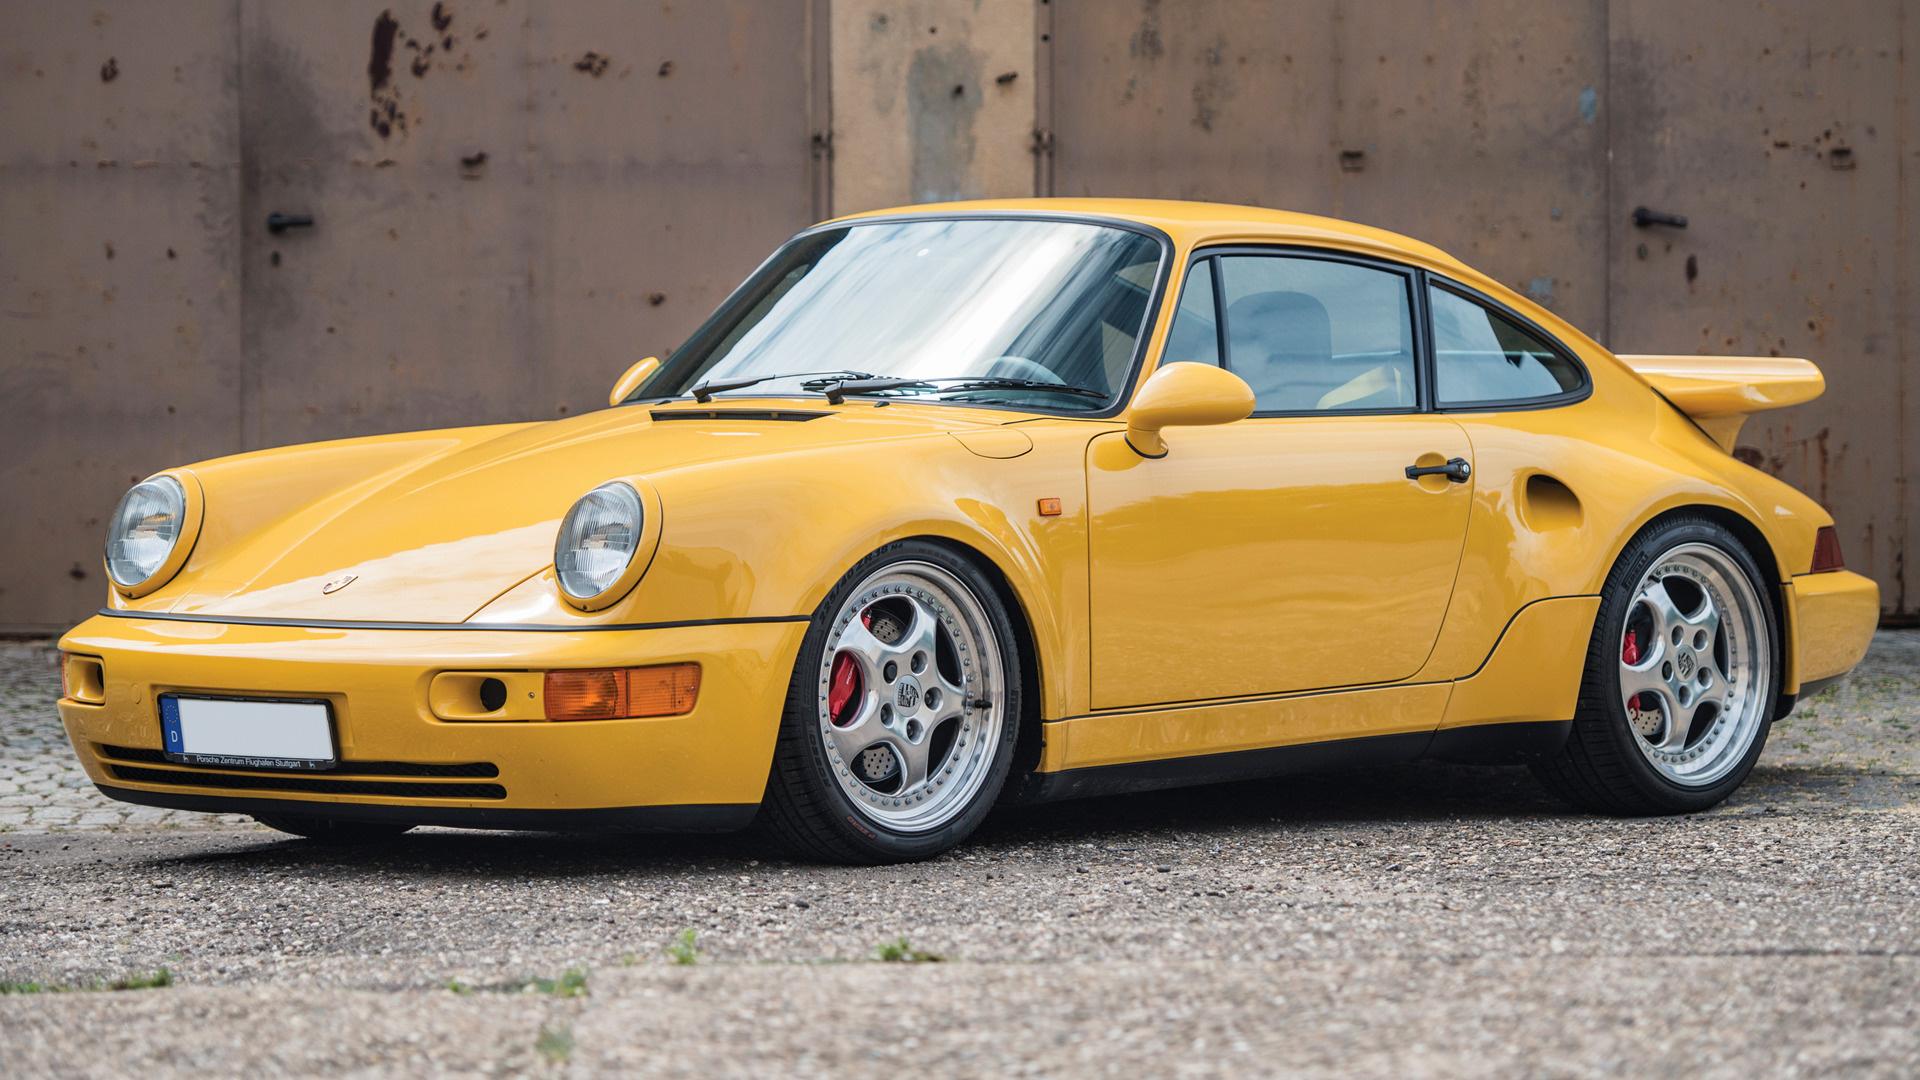 Lightweight Car Seat >> 1992 Porsche 911 Turbo S Lightweight - Wallpapers and HD Images | Car Pixel